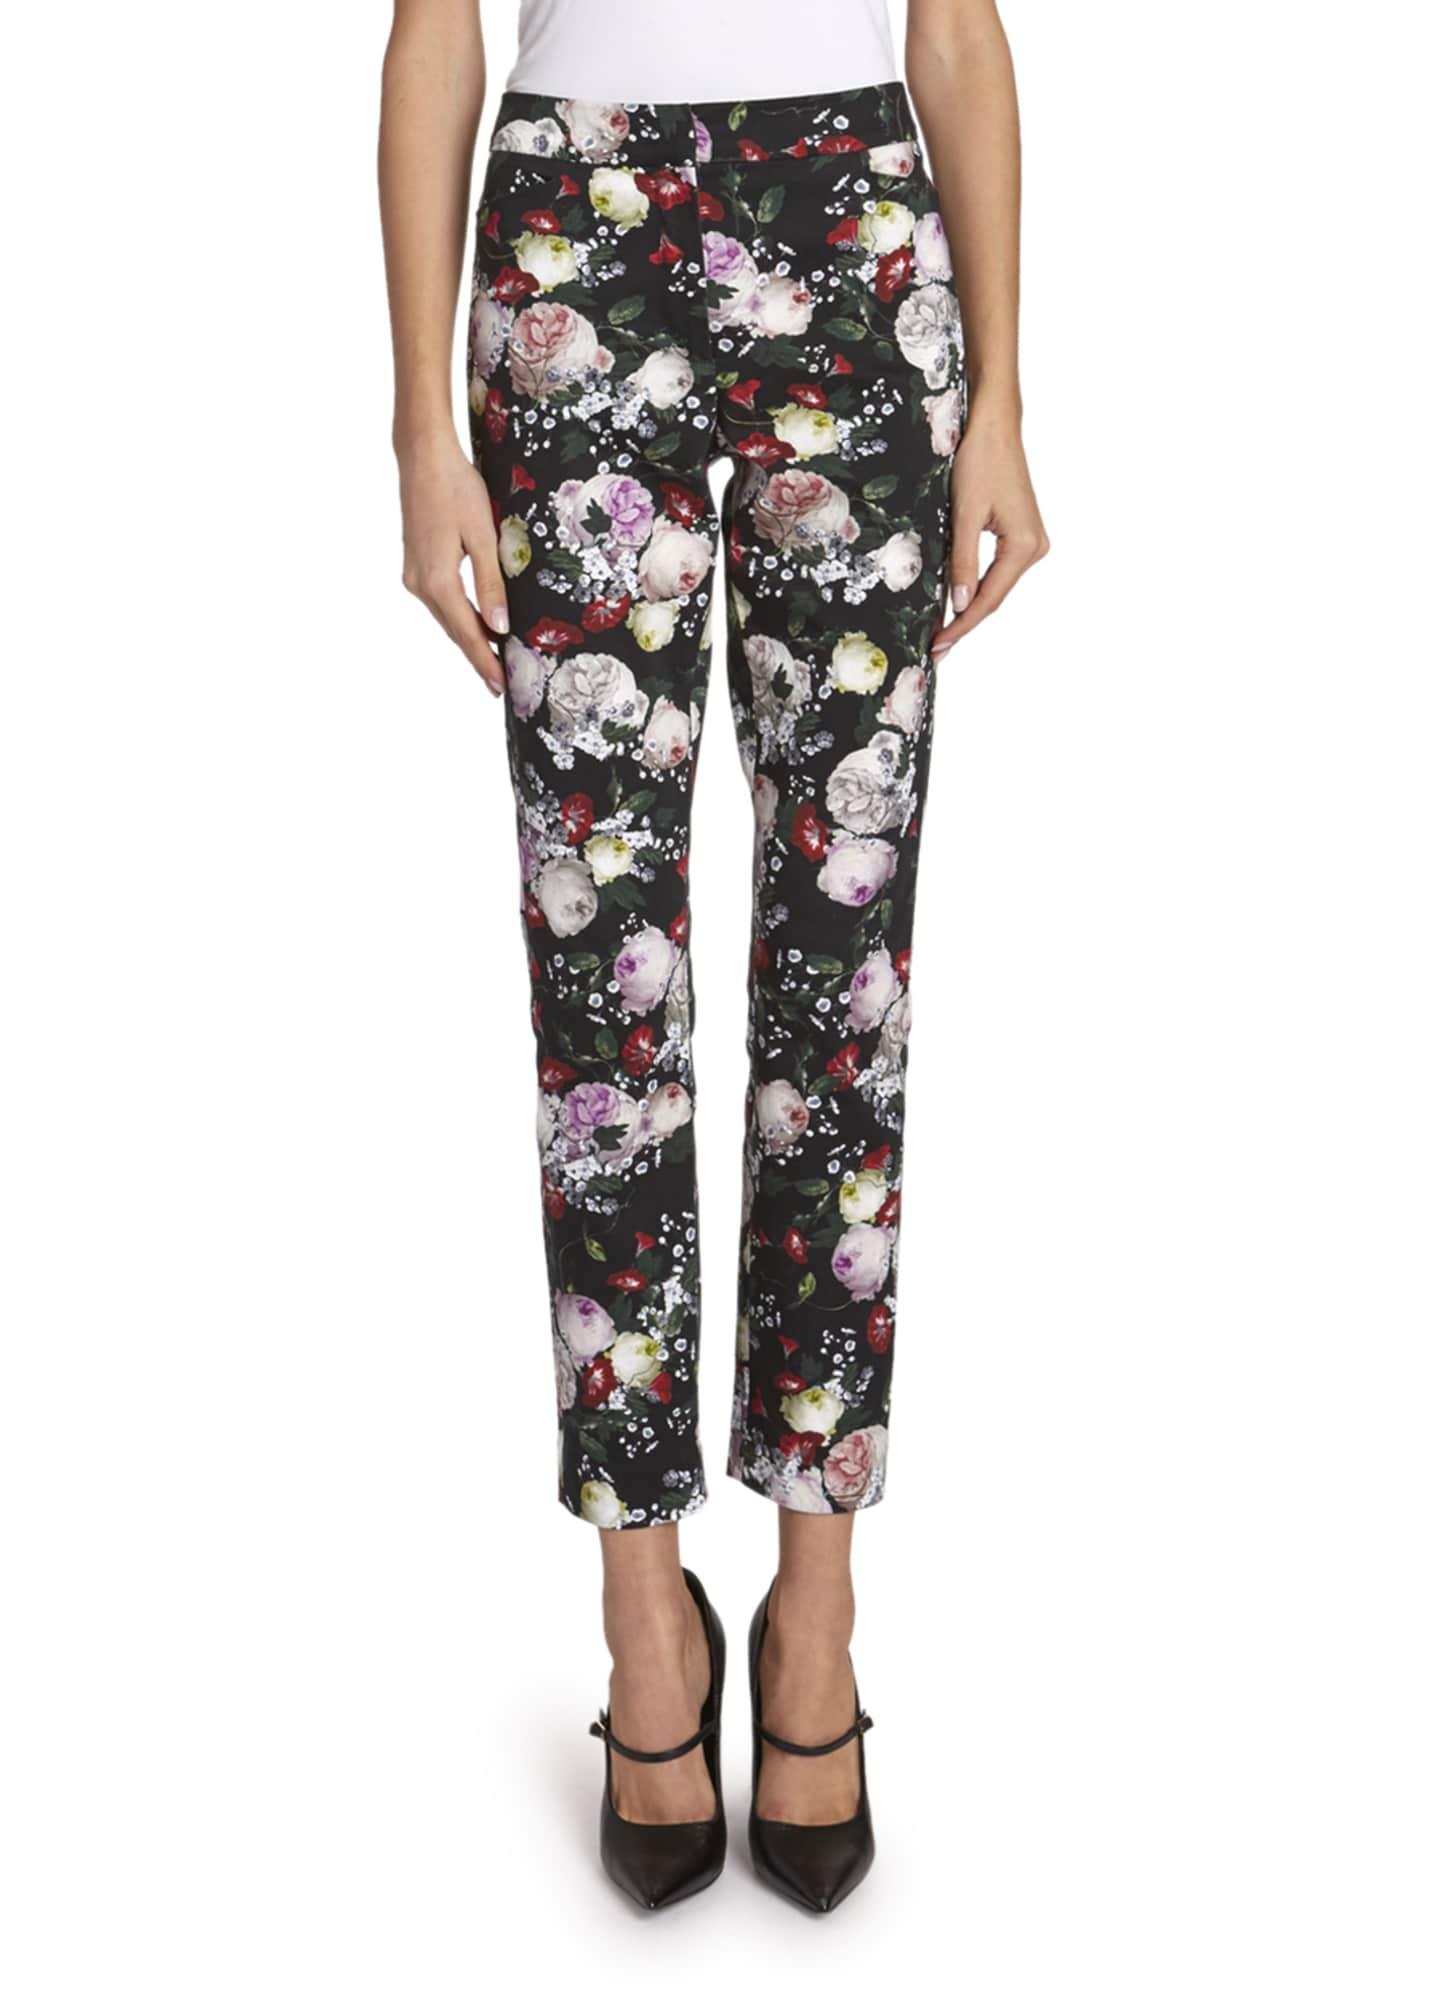 Erdem Sidney Floral-Print Pencil-Leg Pants